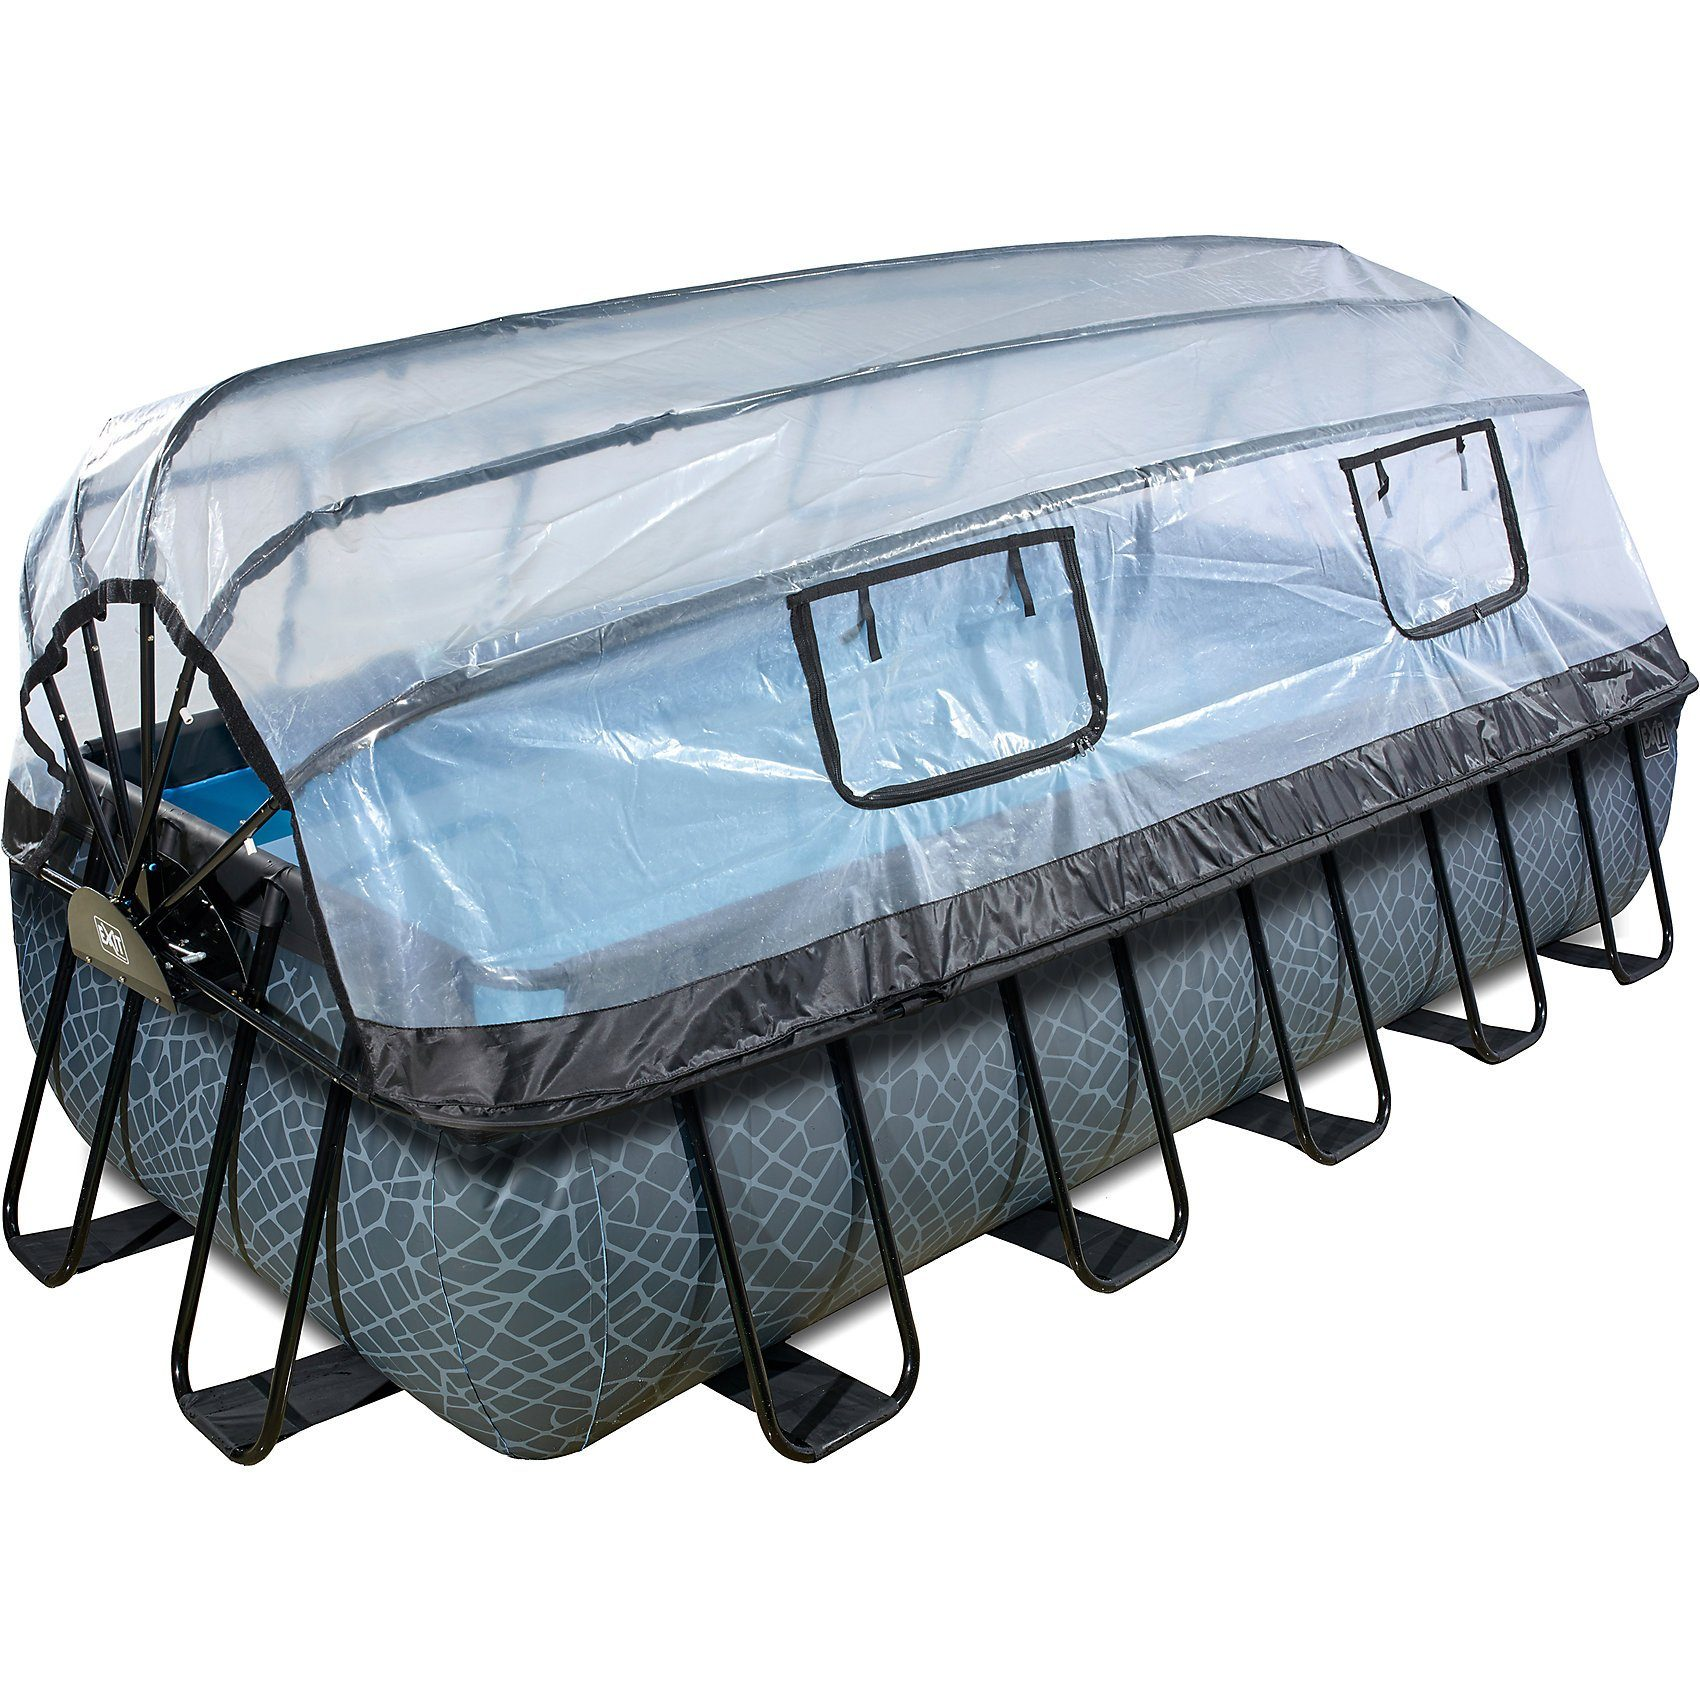 EXIT Frame Pool Premium 5,4x2,5x1m mit Sonnendach, grau